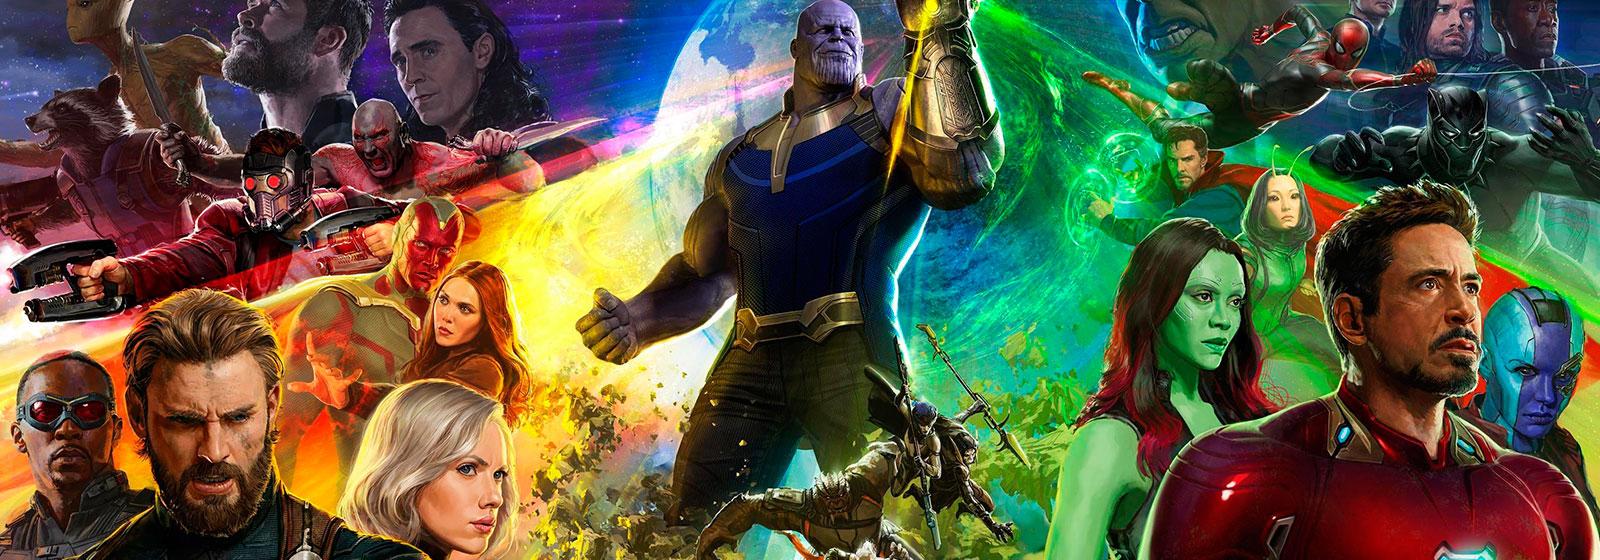 Vingadores: Guerra Infinita, Ganha Cinco Novos Cartazes.